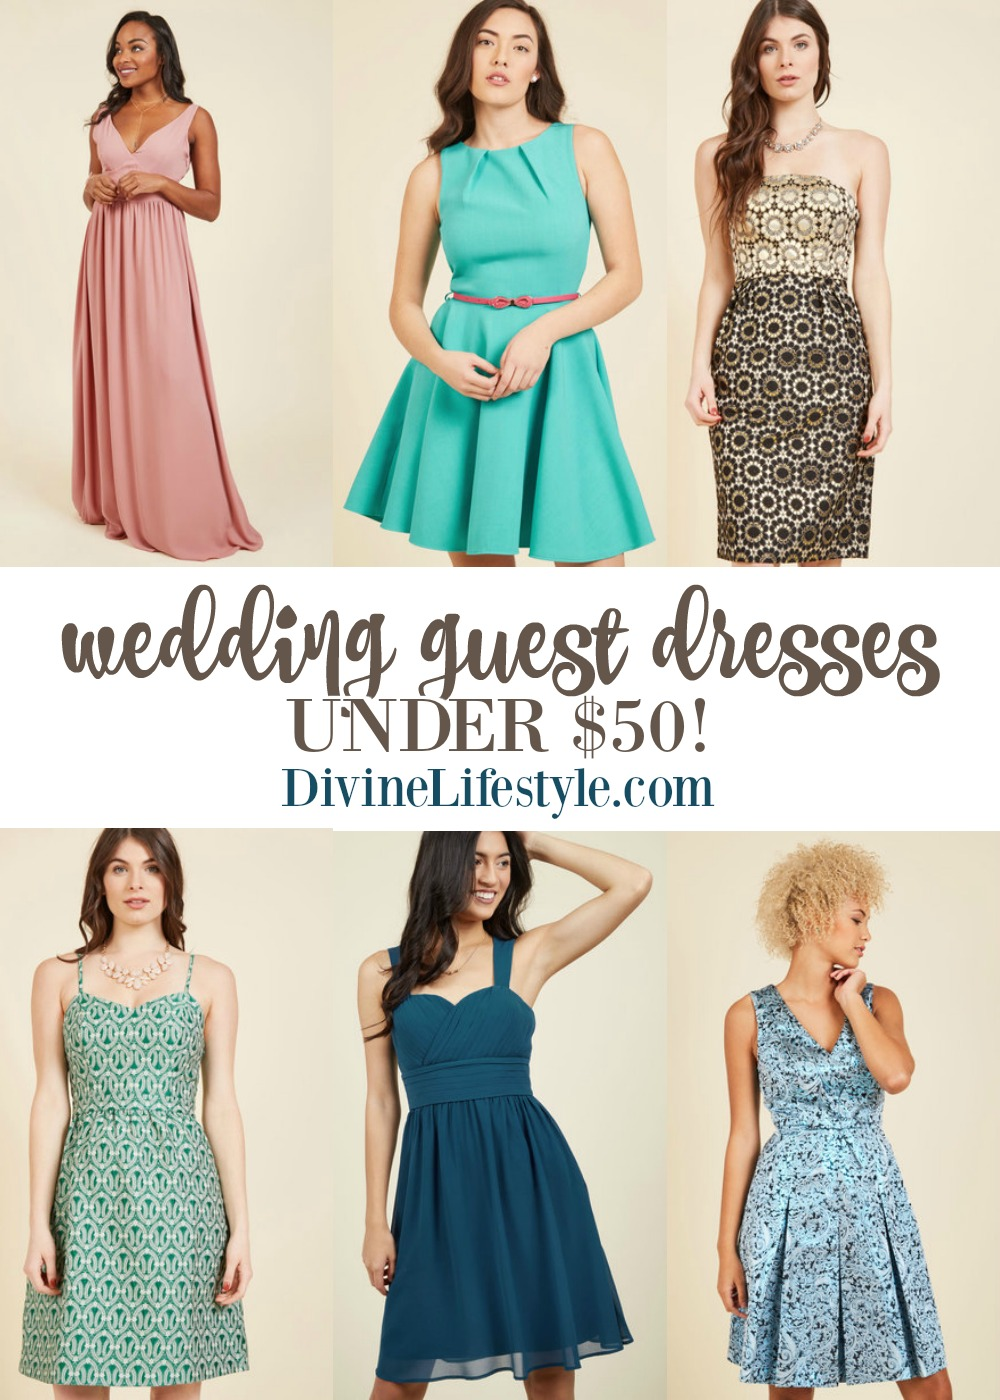 Weddings Guest Dresses 94 Great Wedding Guest Dresses Under